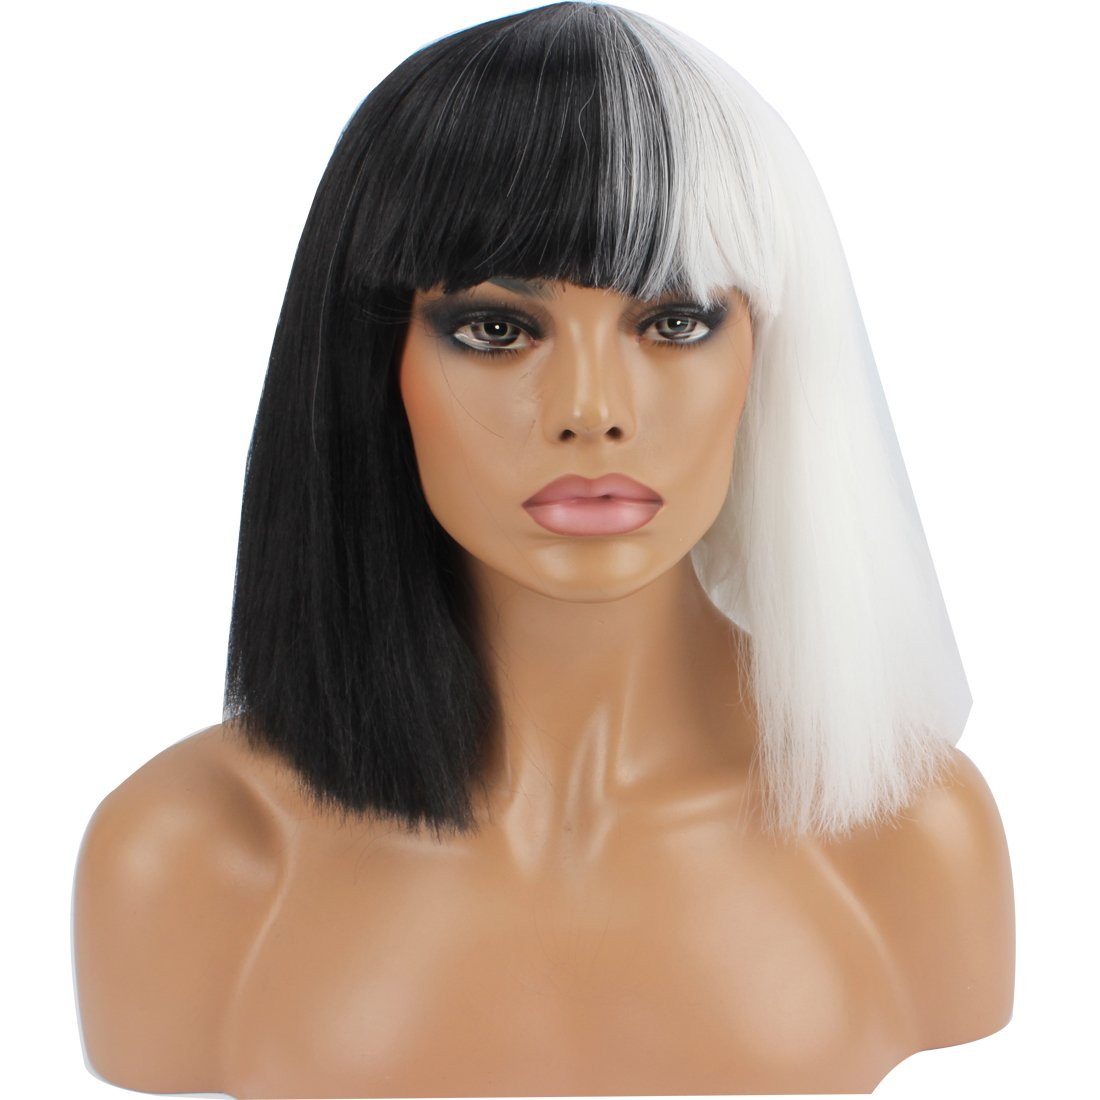 WeKen Halloween Wig Women Short Bob Kinky Straight Full Bangs Synthetic Black and White by WeKen